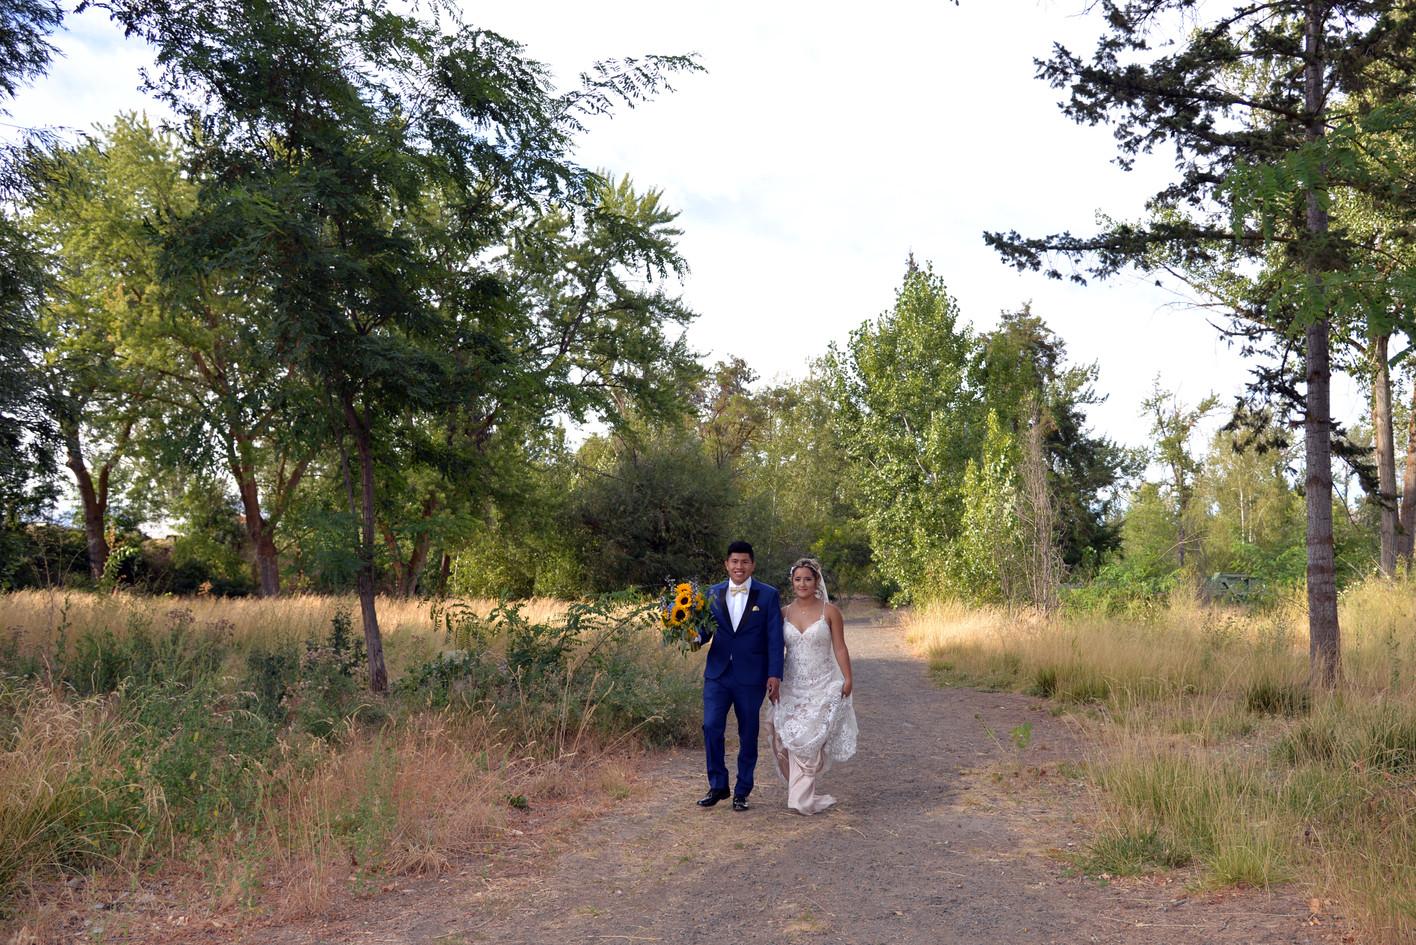 DSC_2258 copy wedding photographer yakima EDITED NO LOGO.jpg